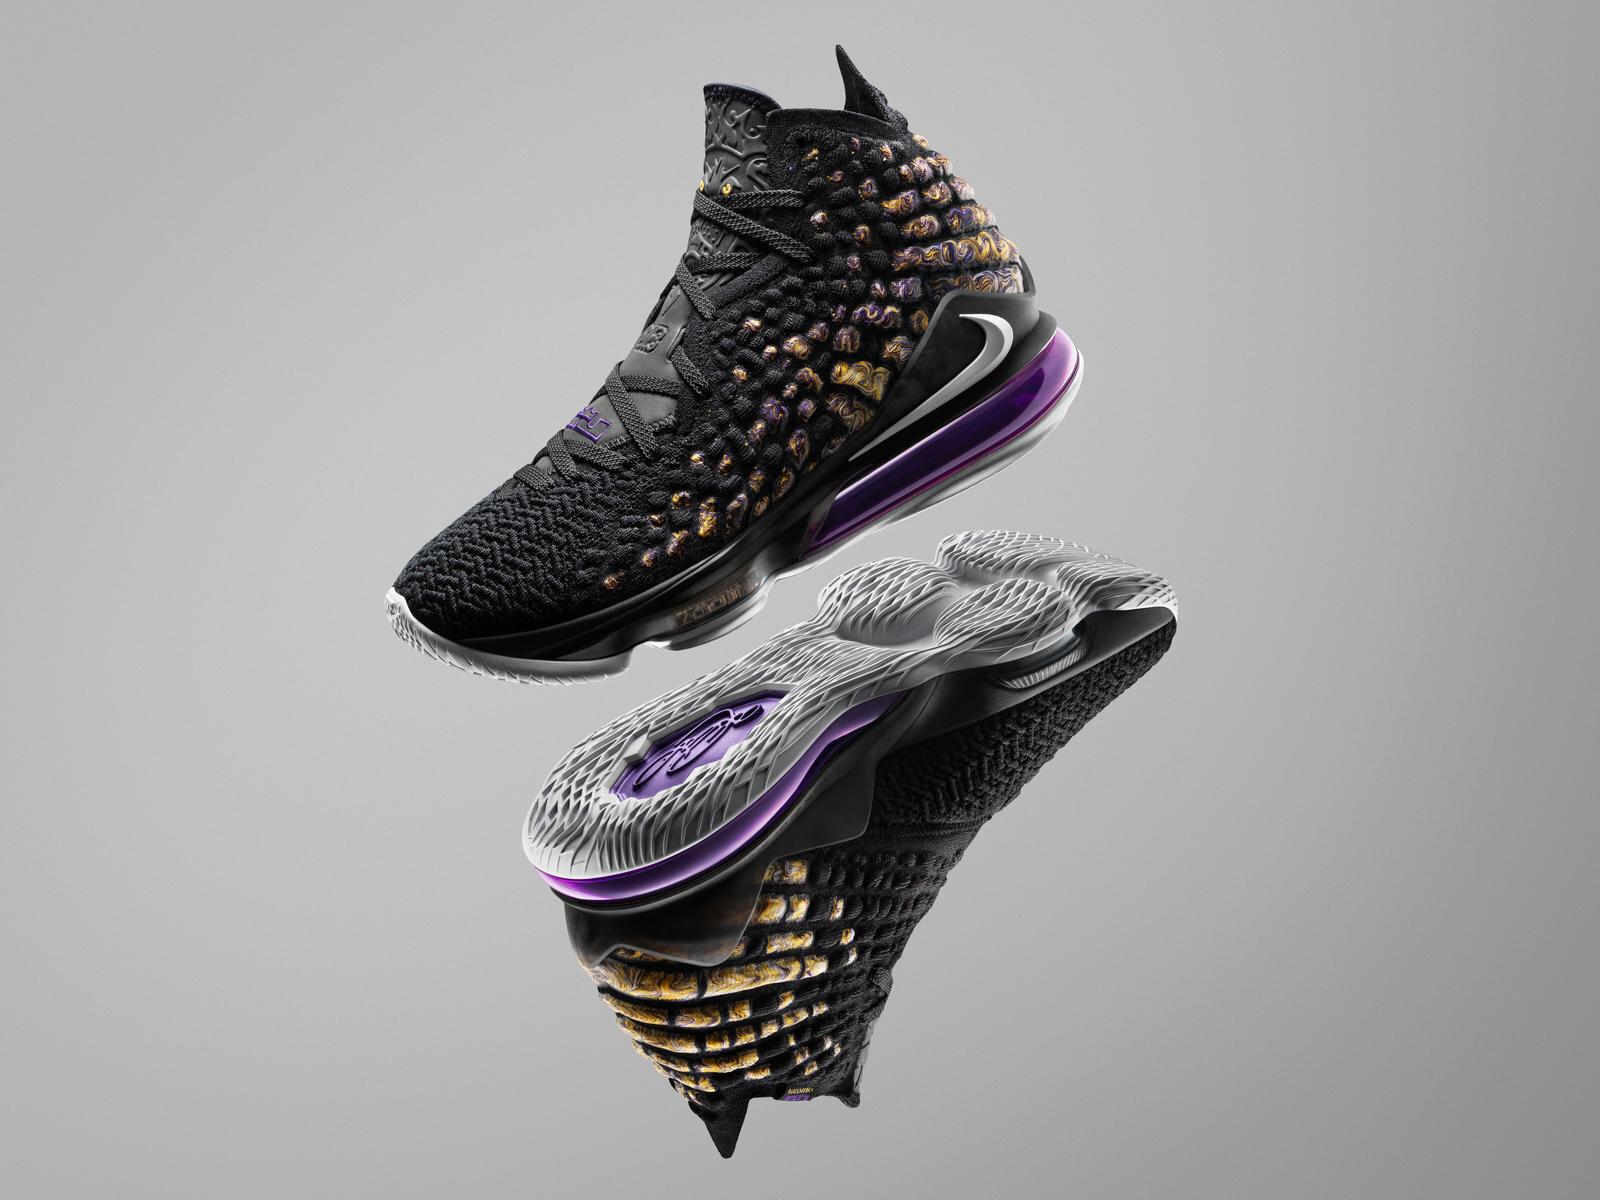 NikeNews_HO19_BB_LeBron17_Purple_Gold_Hero_90403.jpg